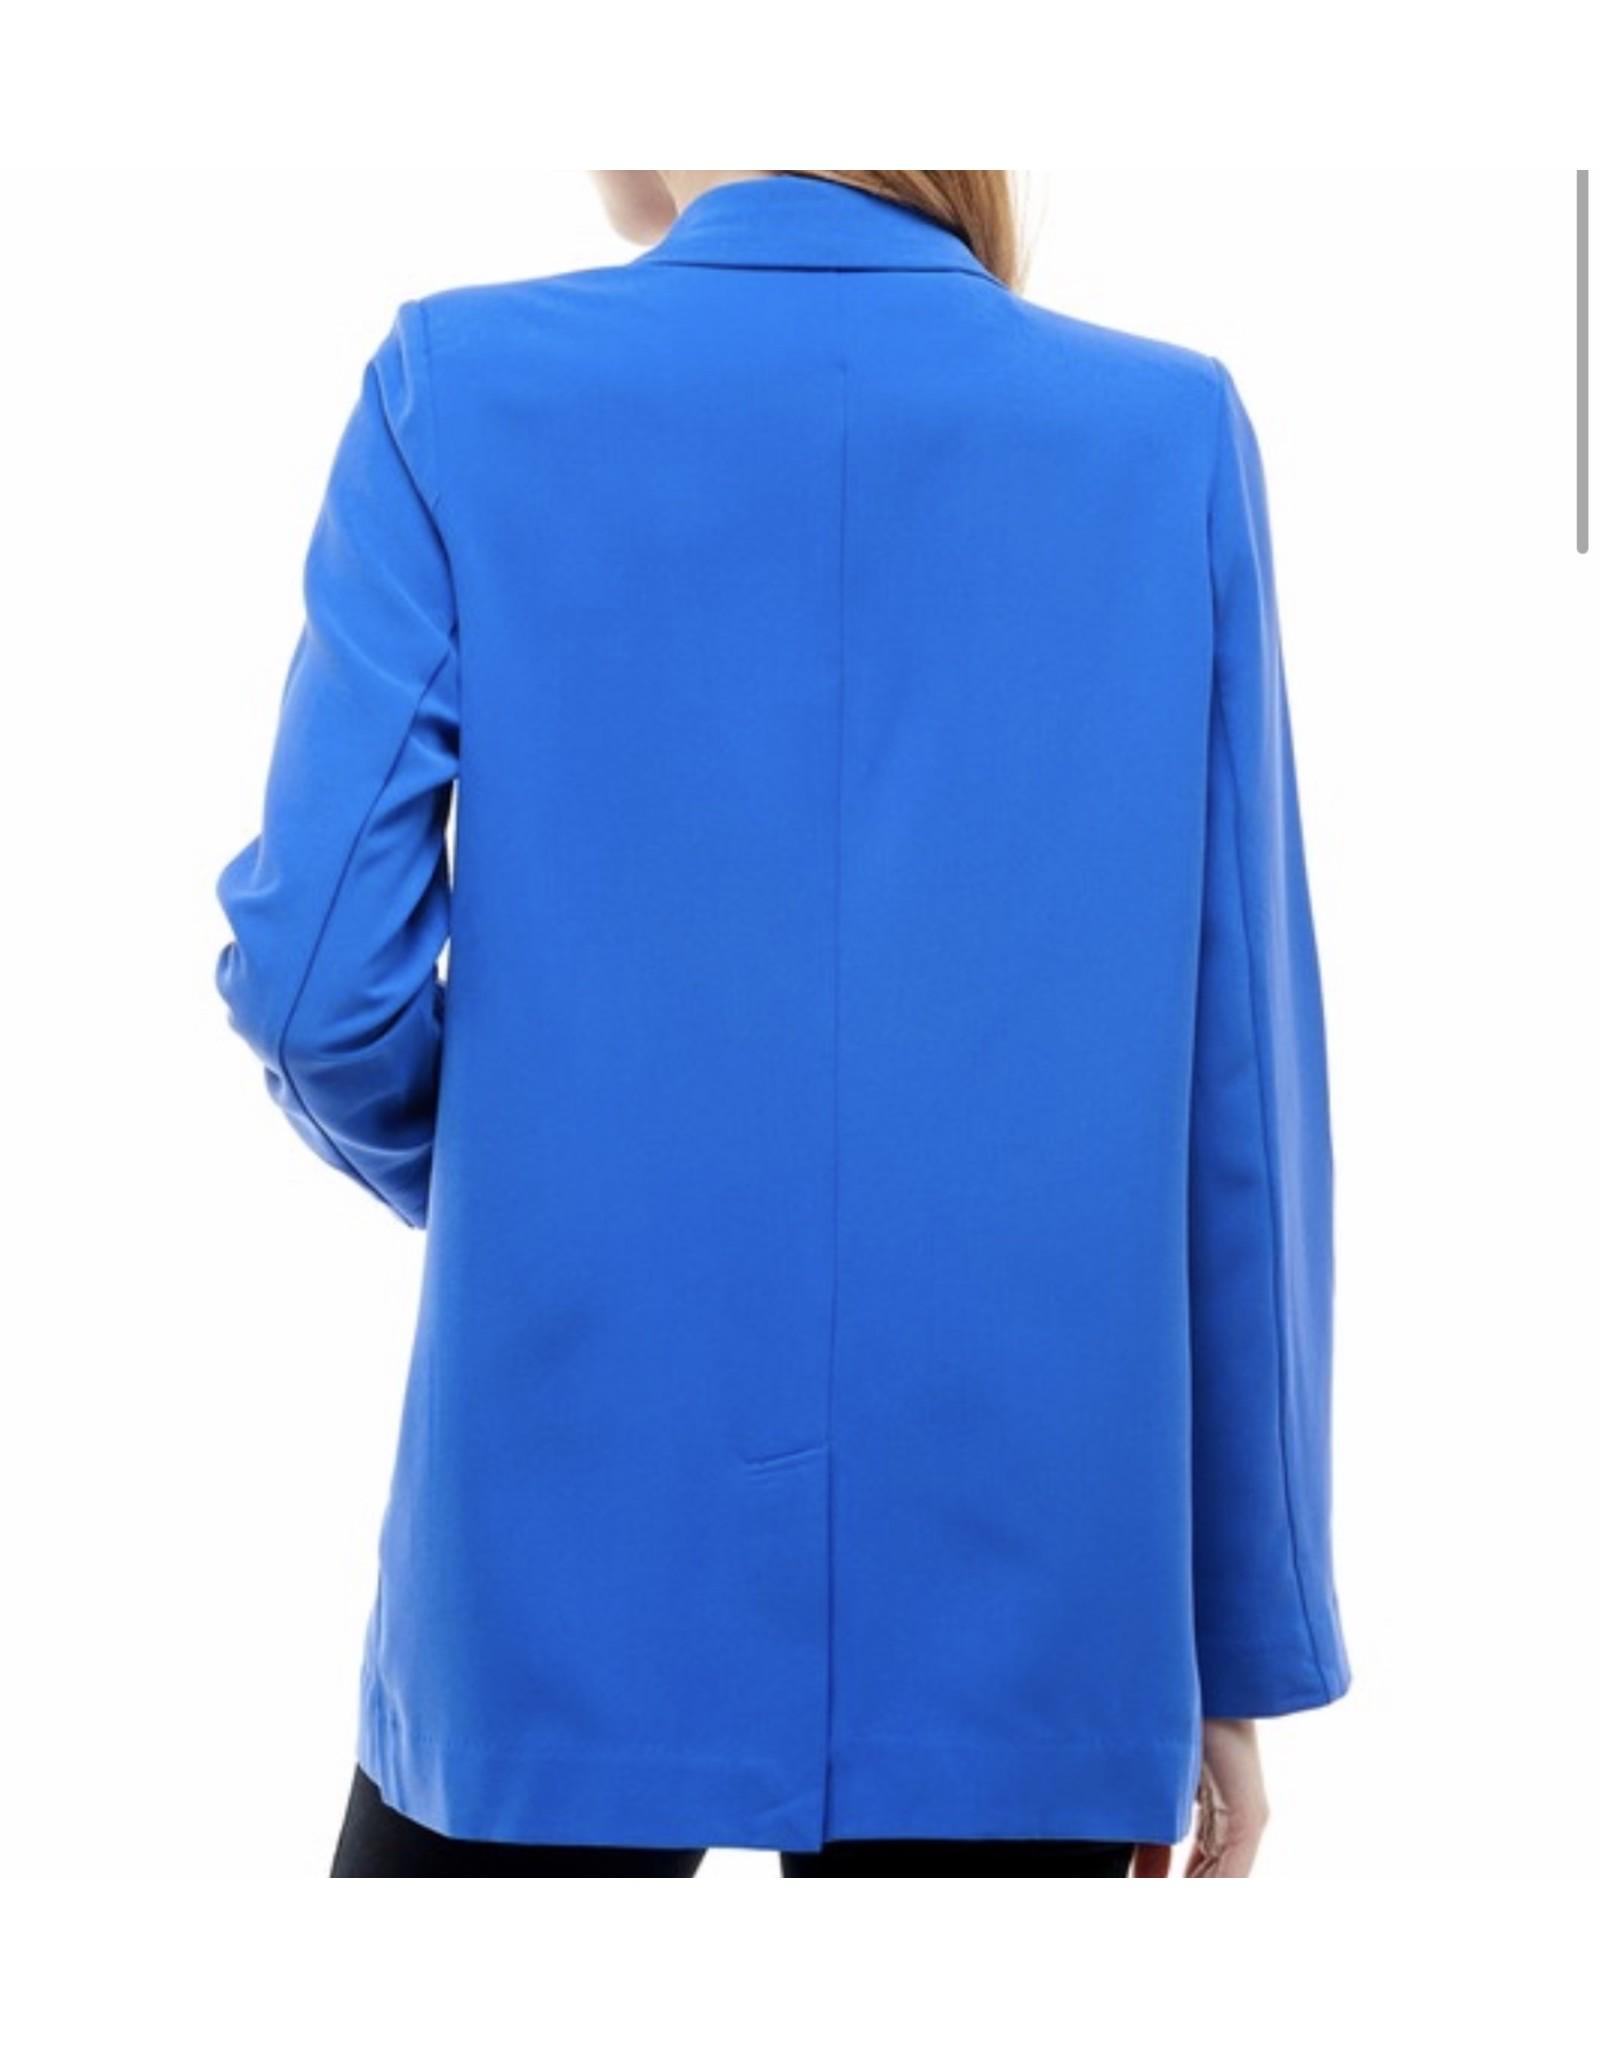 Lightweight Blazer - Royal Blue